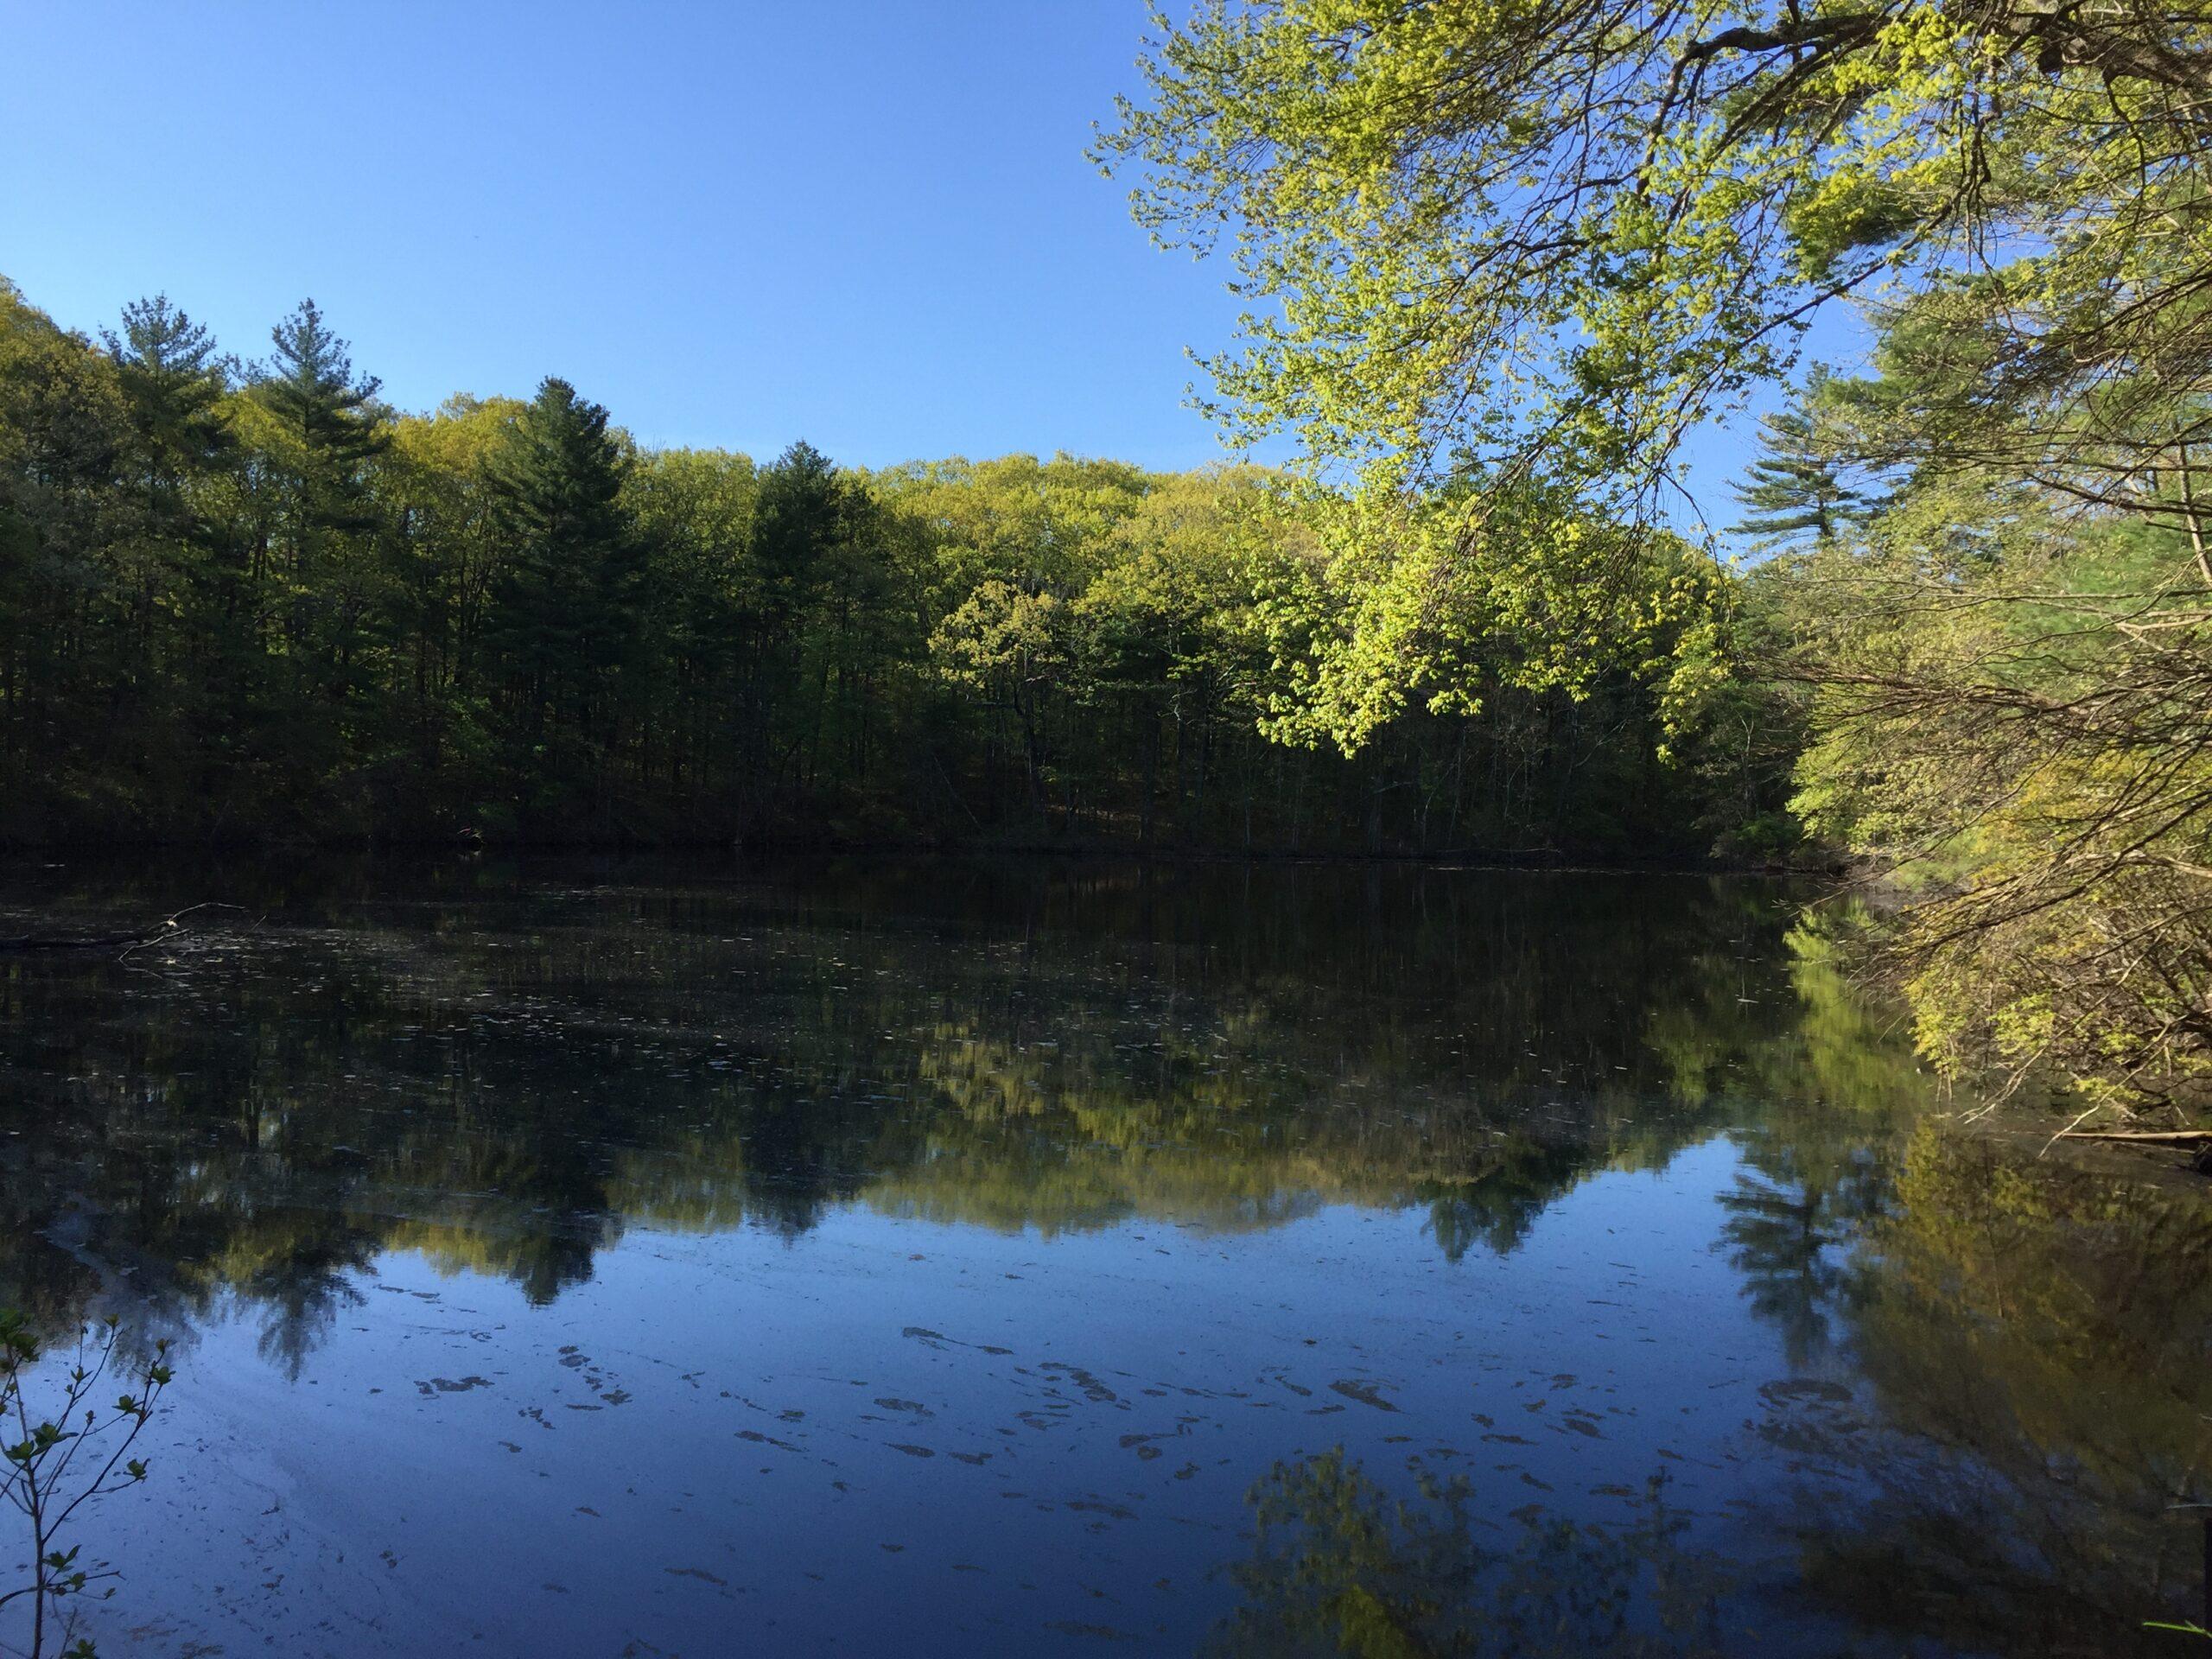 Noanet Woodlands